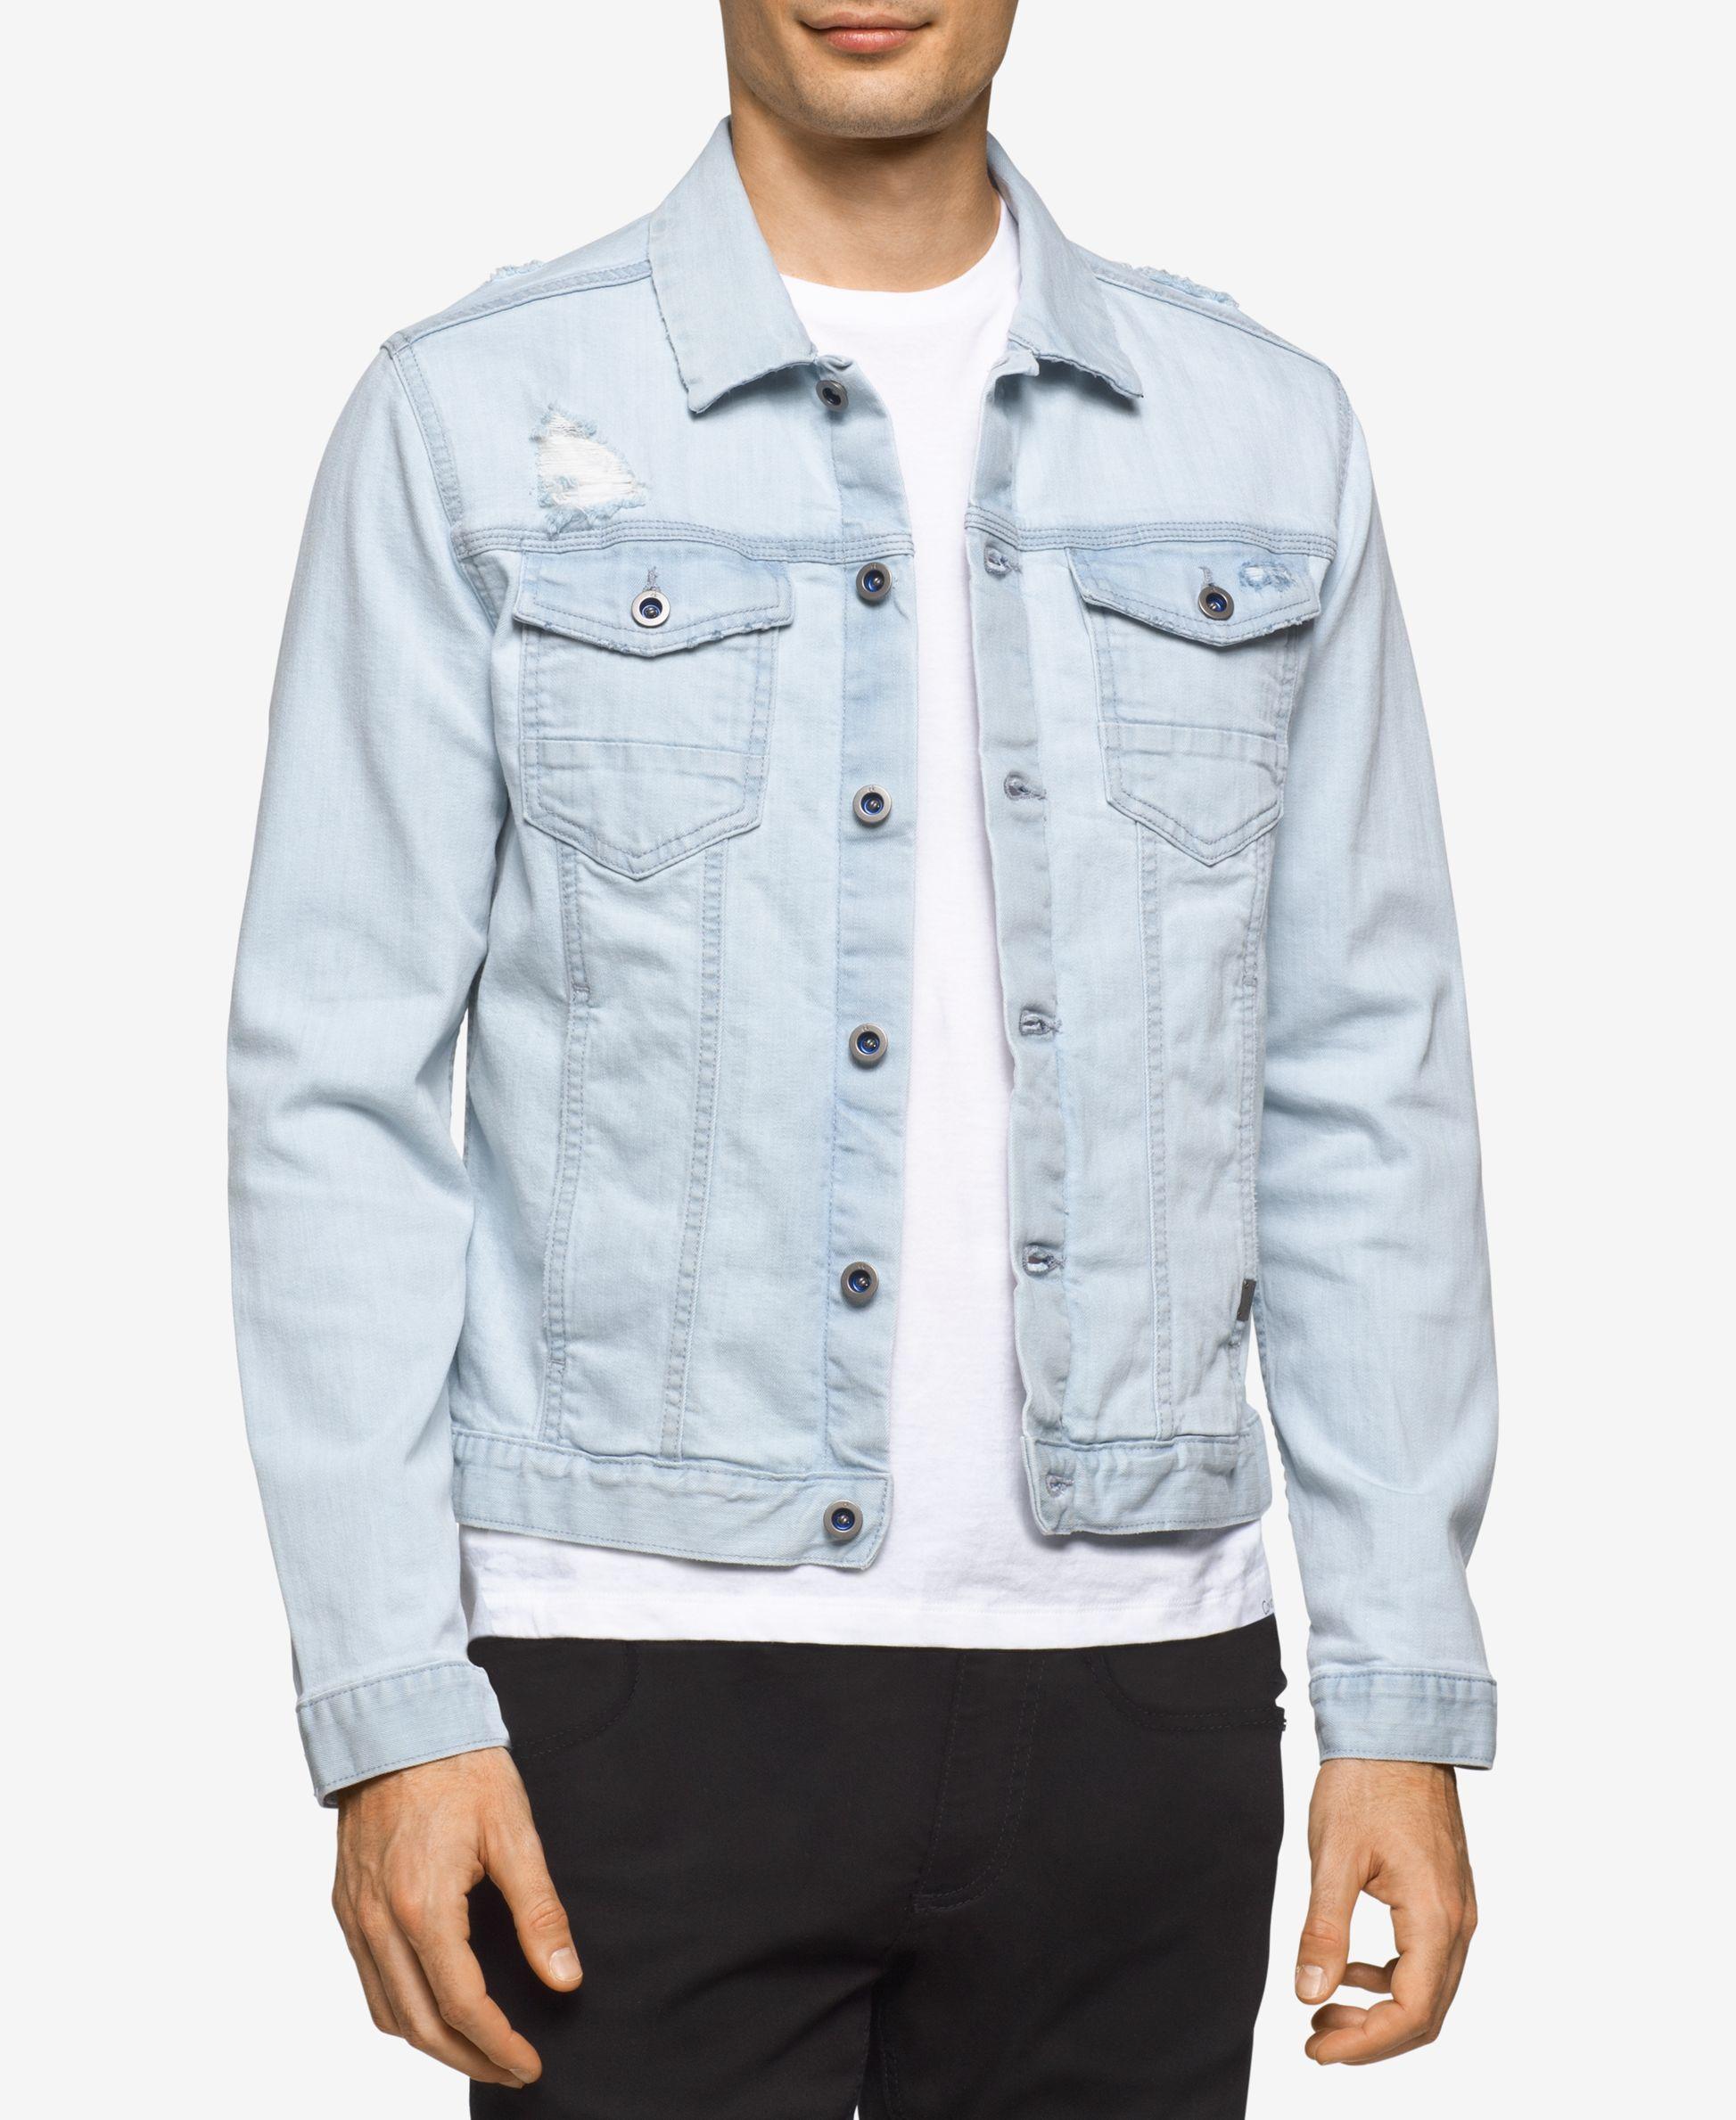 Calvin Klein Jeans Men S Clear Sky Denim Trucker Jacket White Denim Jacket Mens White Denim Jacket Calvin Klein Jeans [ 2378 x 1947 Pixel ]